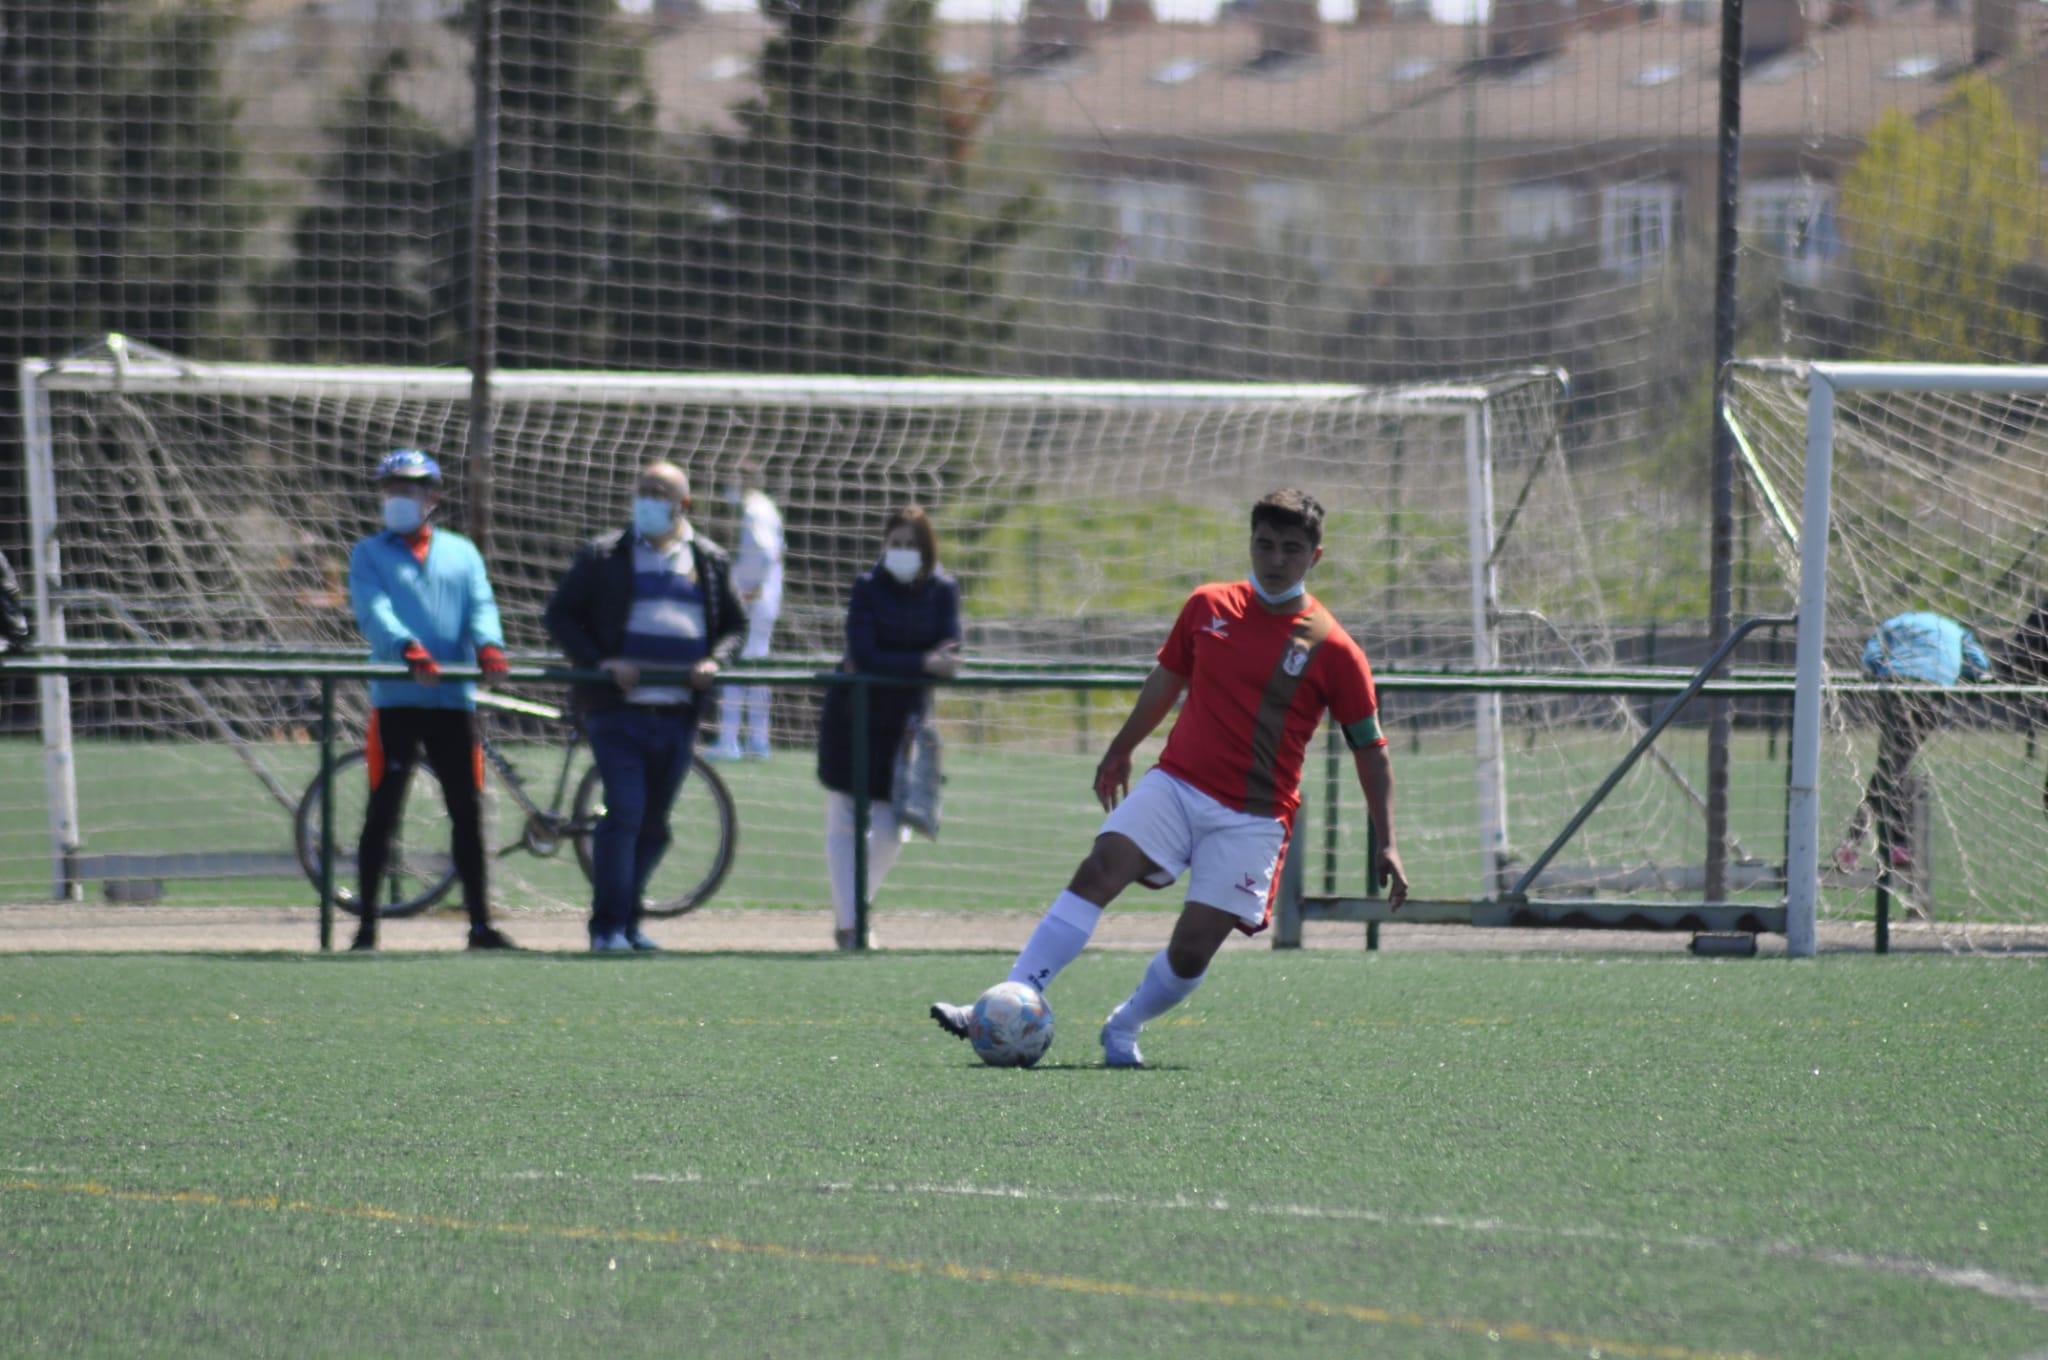 sds1 contra 1: César Contreras